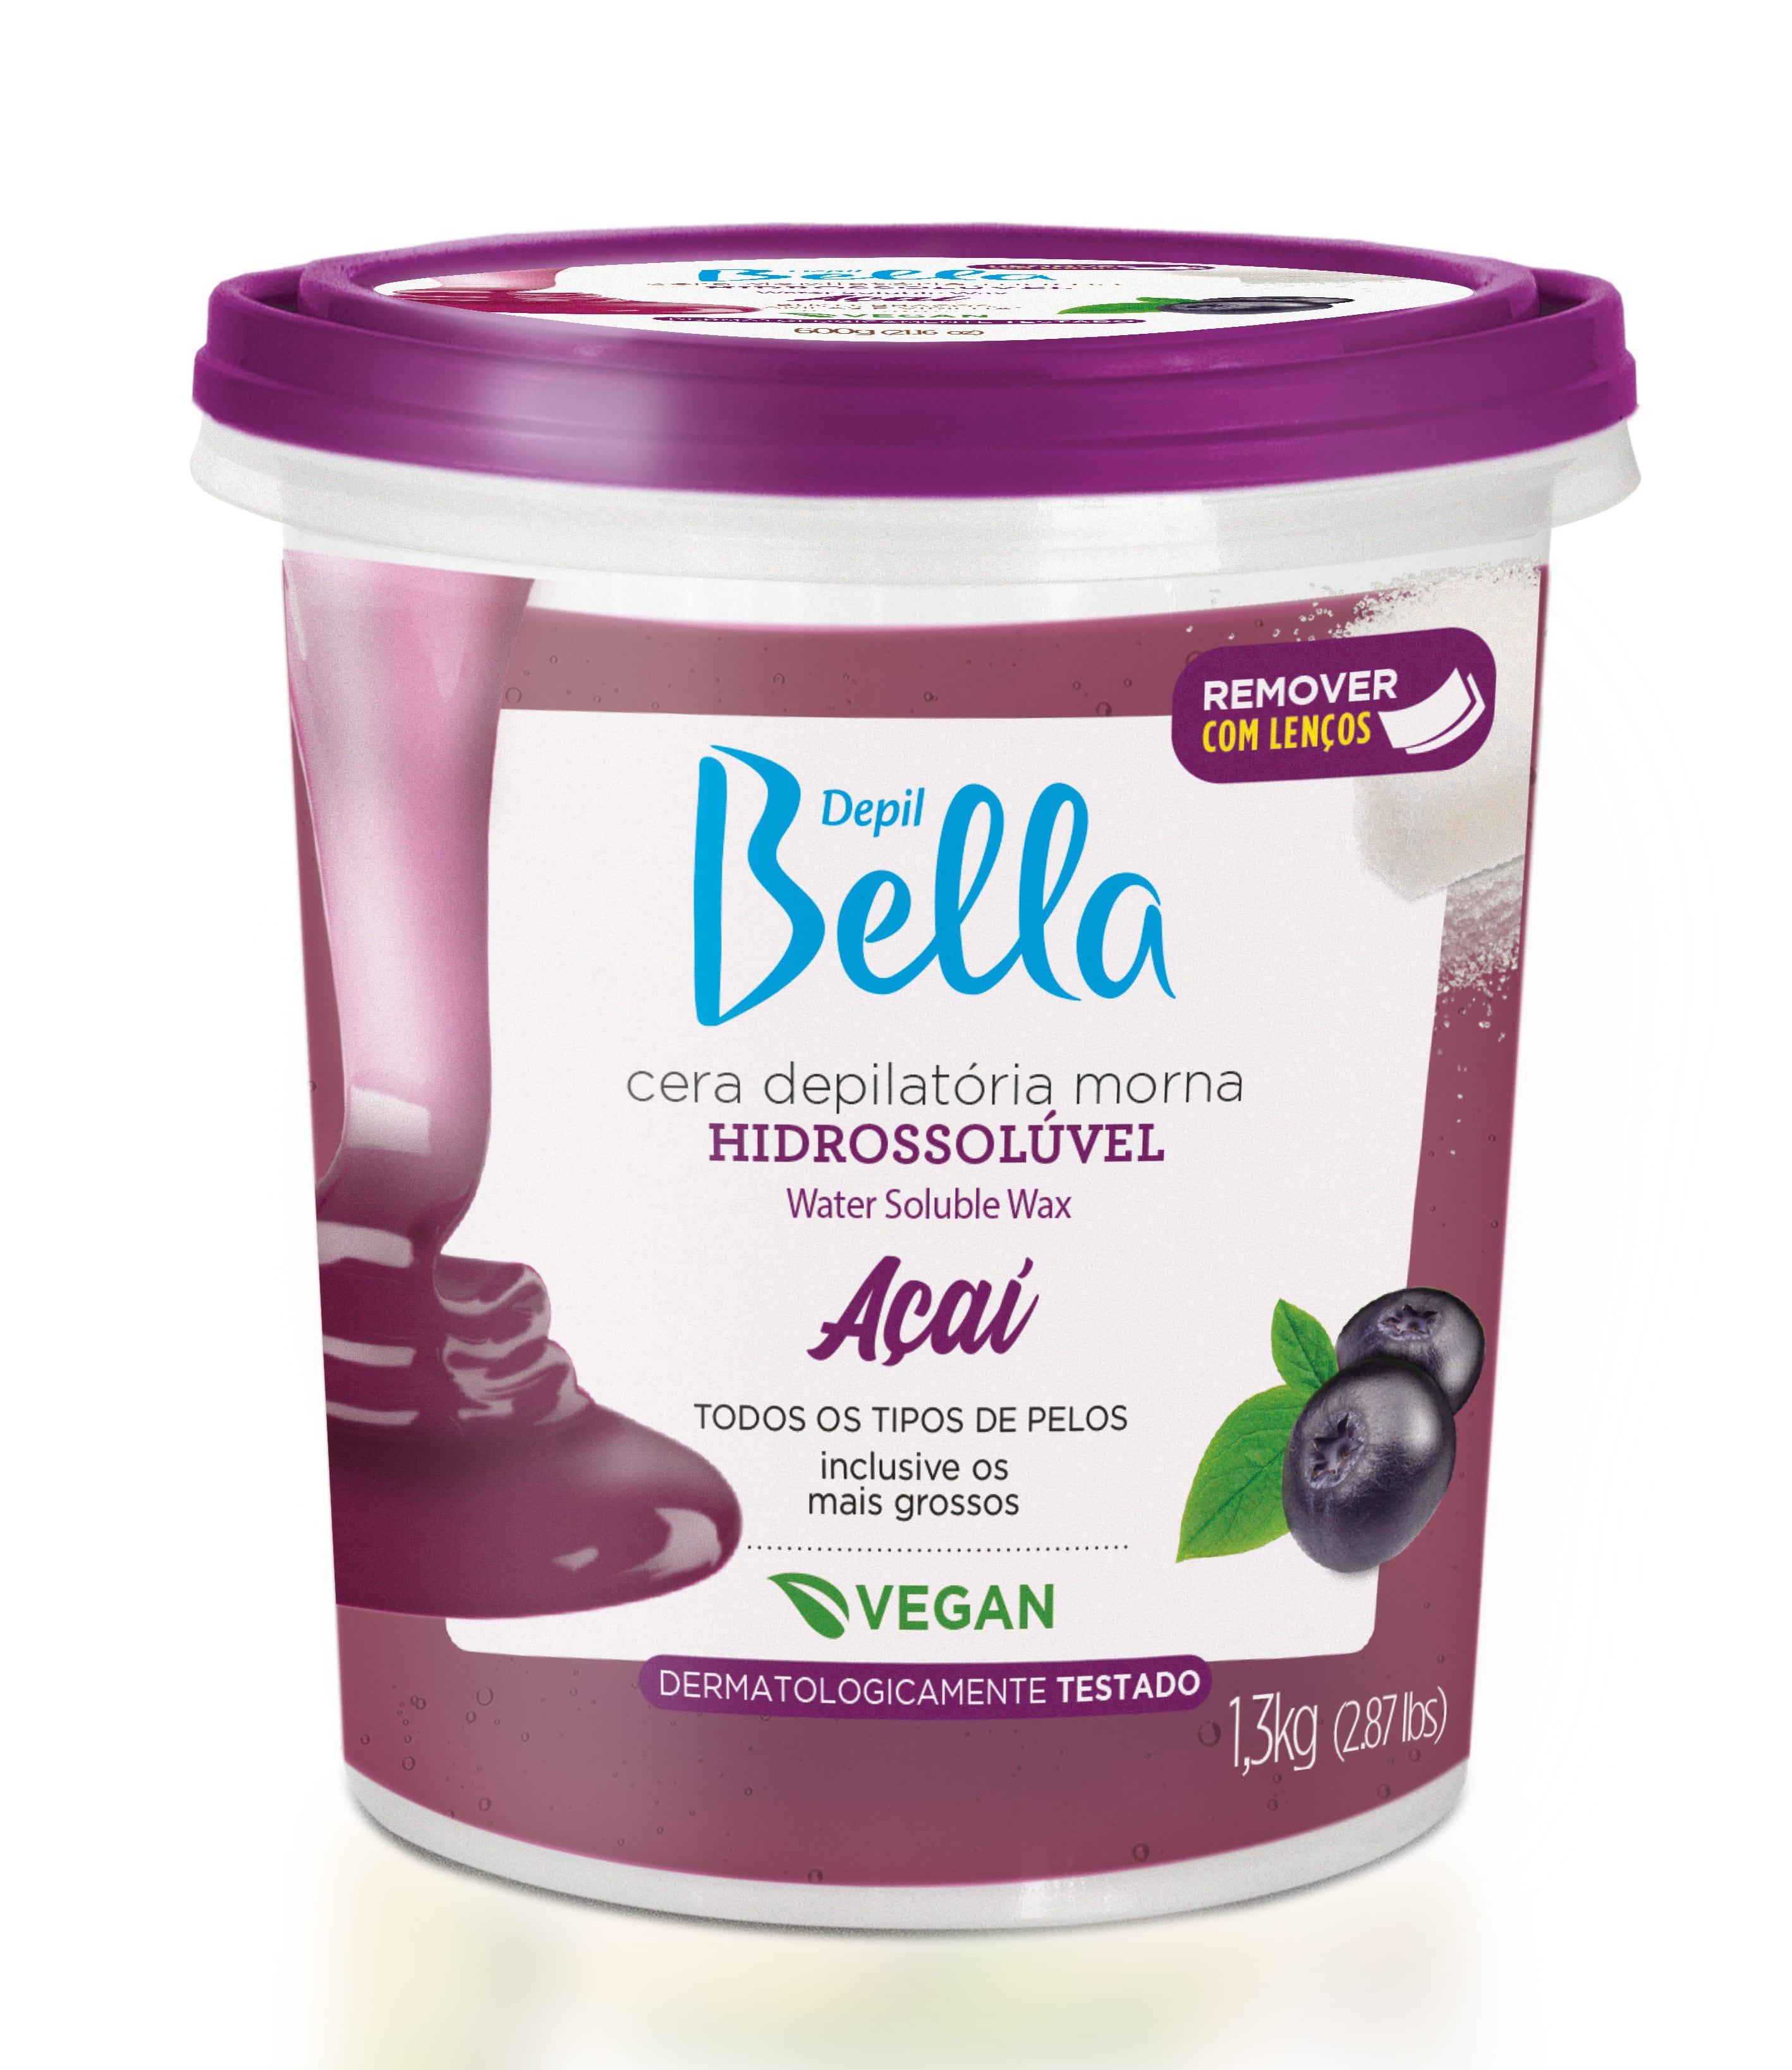 Cera Depil Bella Hidrossoluvel 1,3kg Acai Vegana